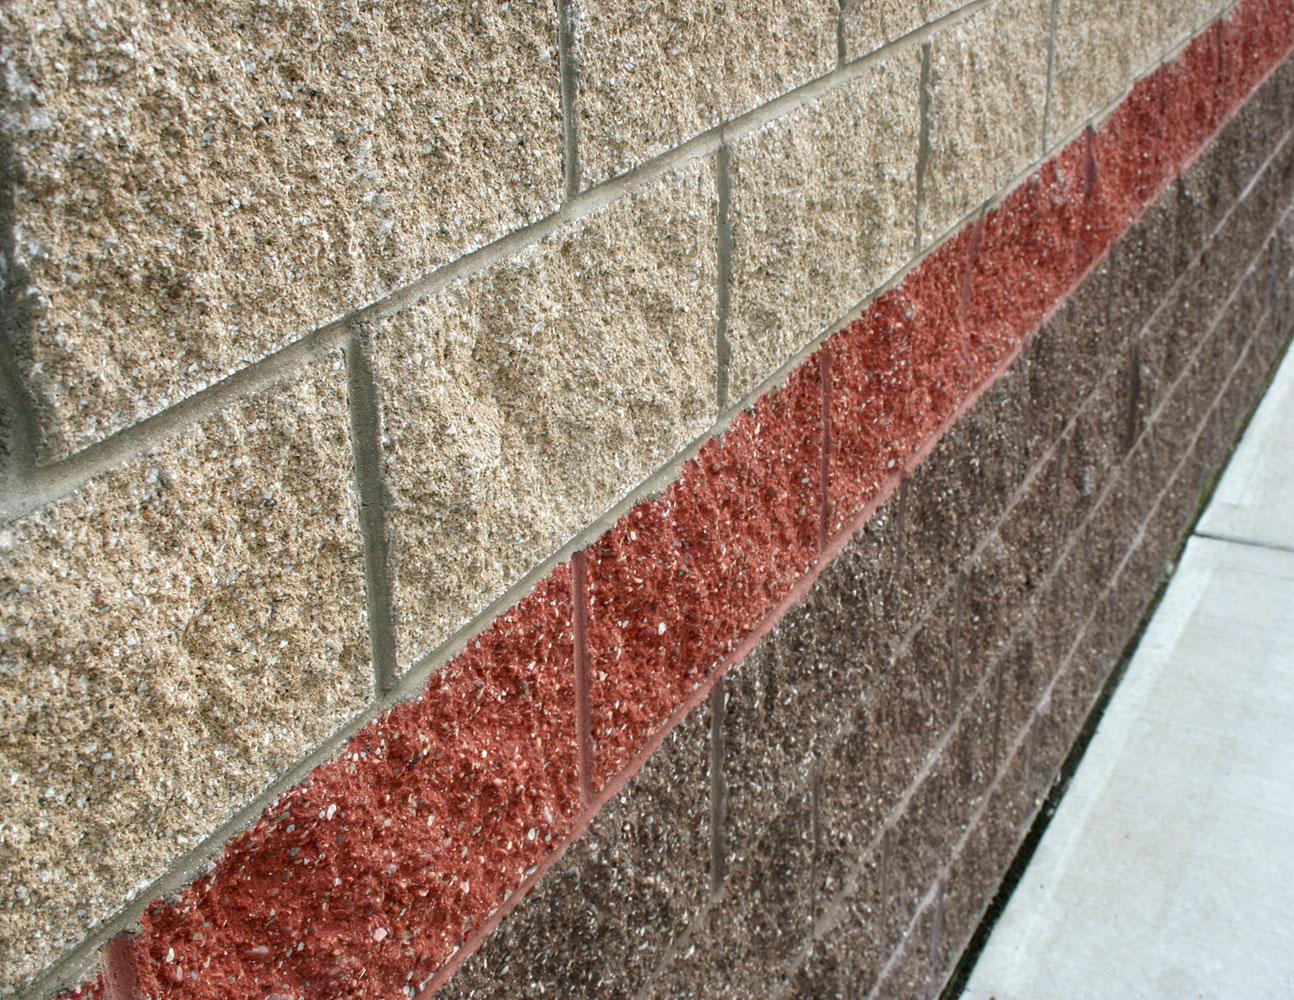 grand-rapids-michigan-certified-concrete-gallery-1.jpg